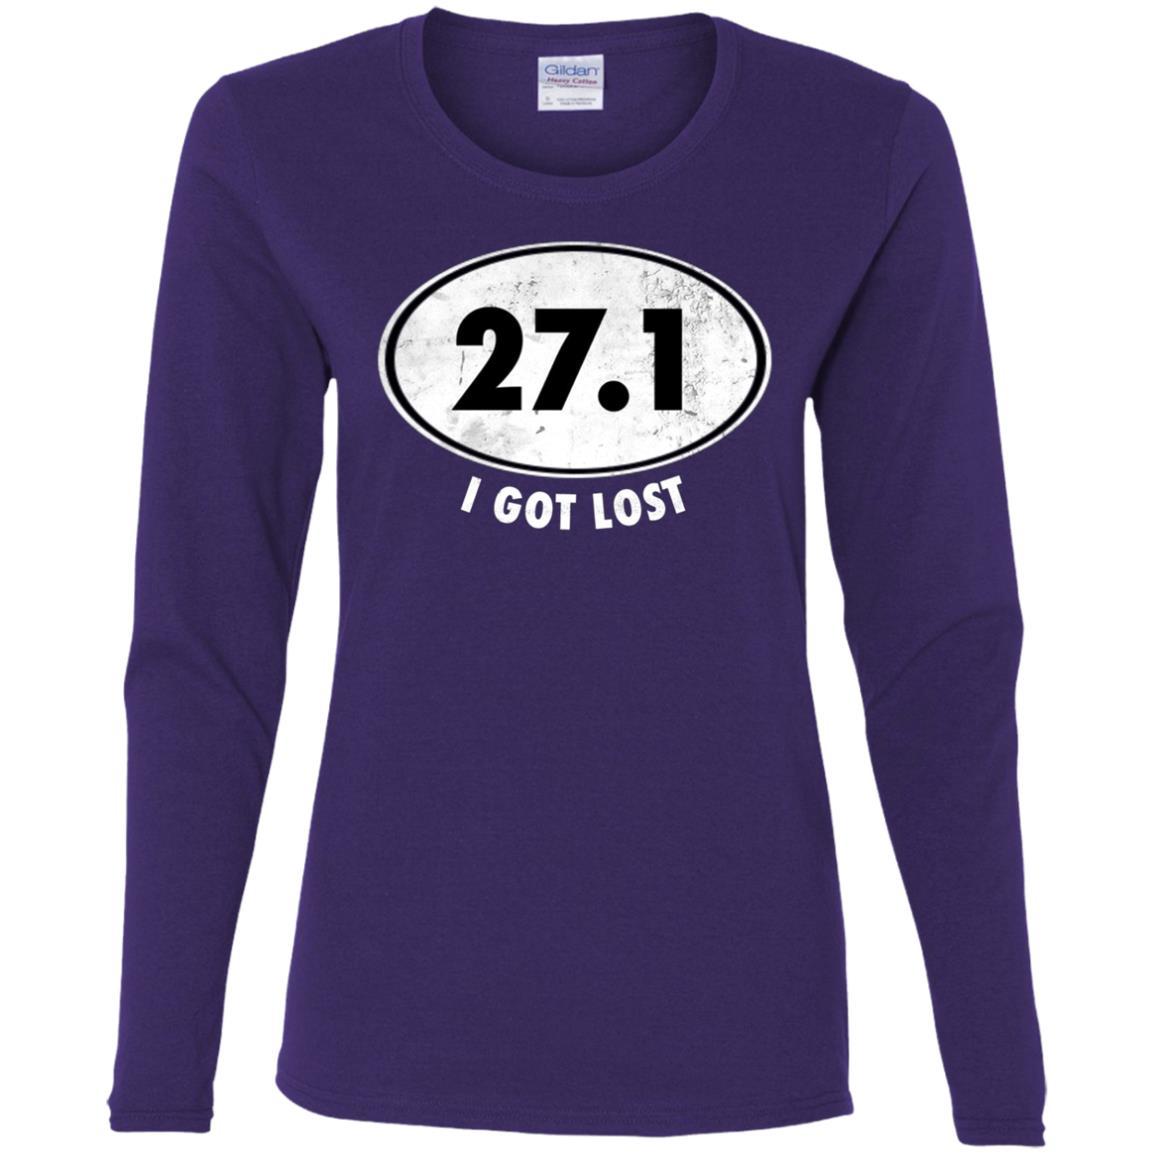 27.1 I Got Lost Funny Marathon Runner Tee Women Long Sleeve T-Shirt